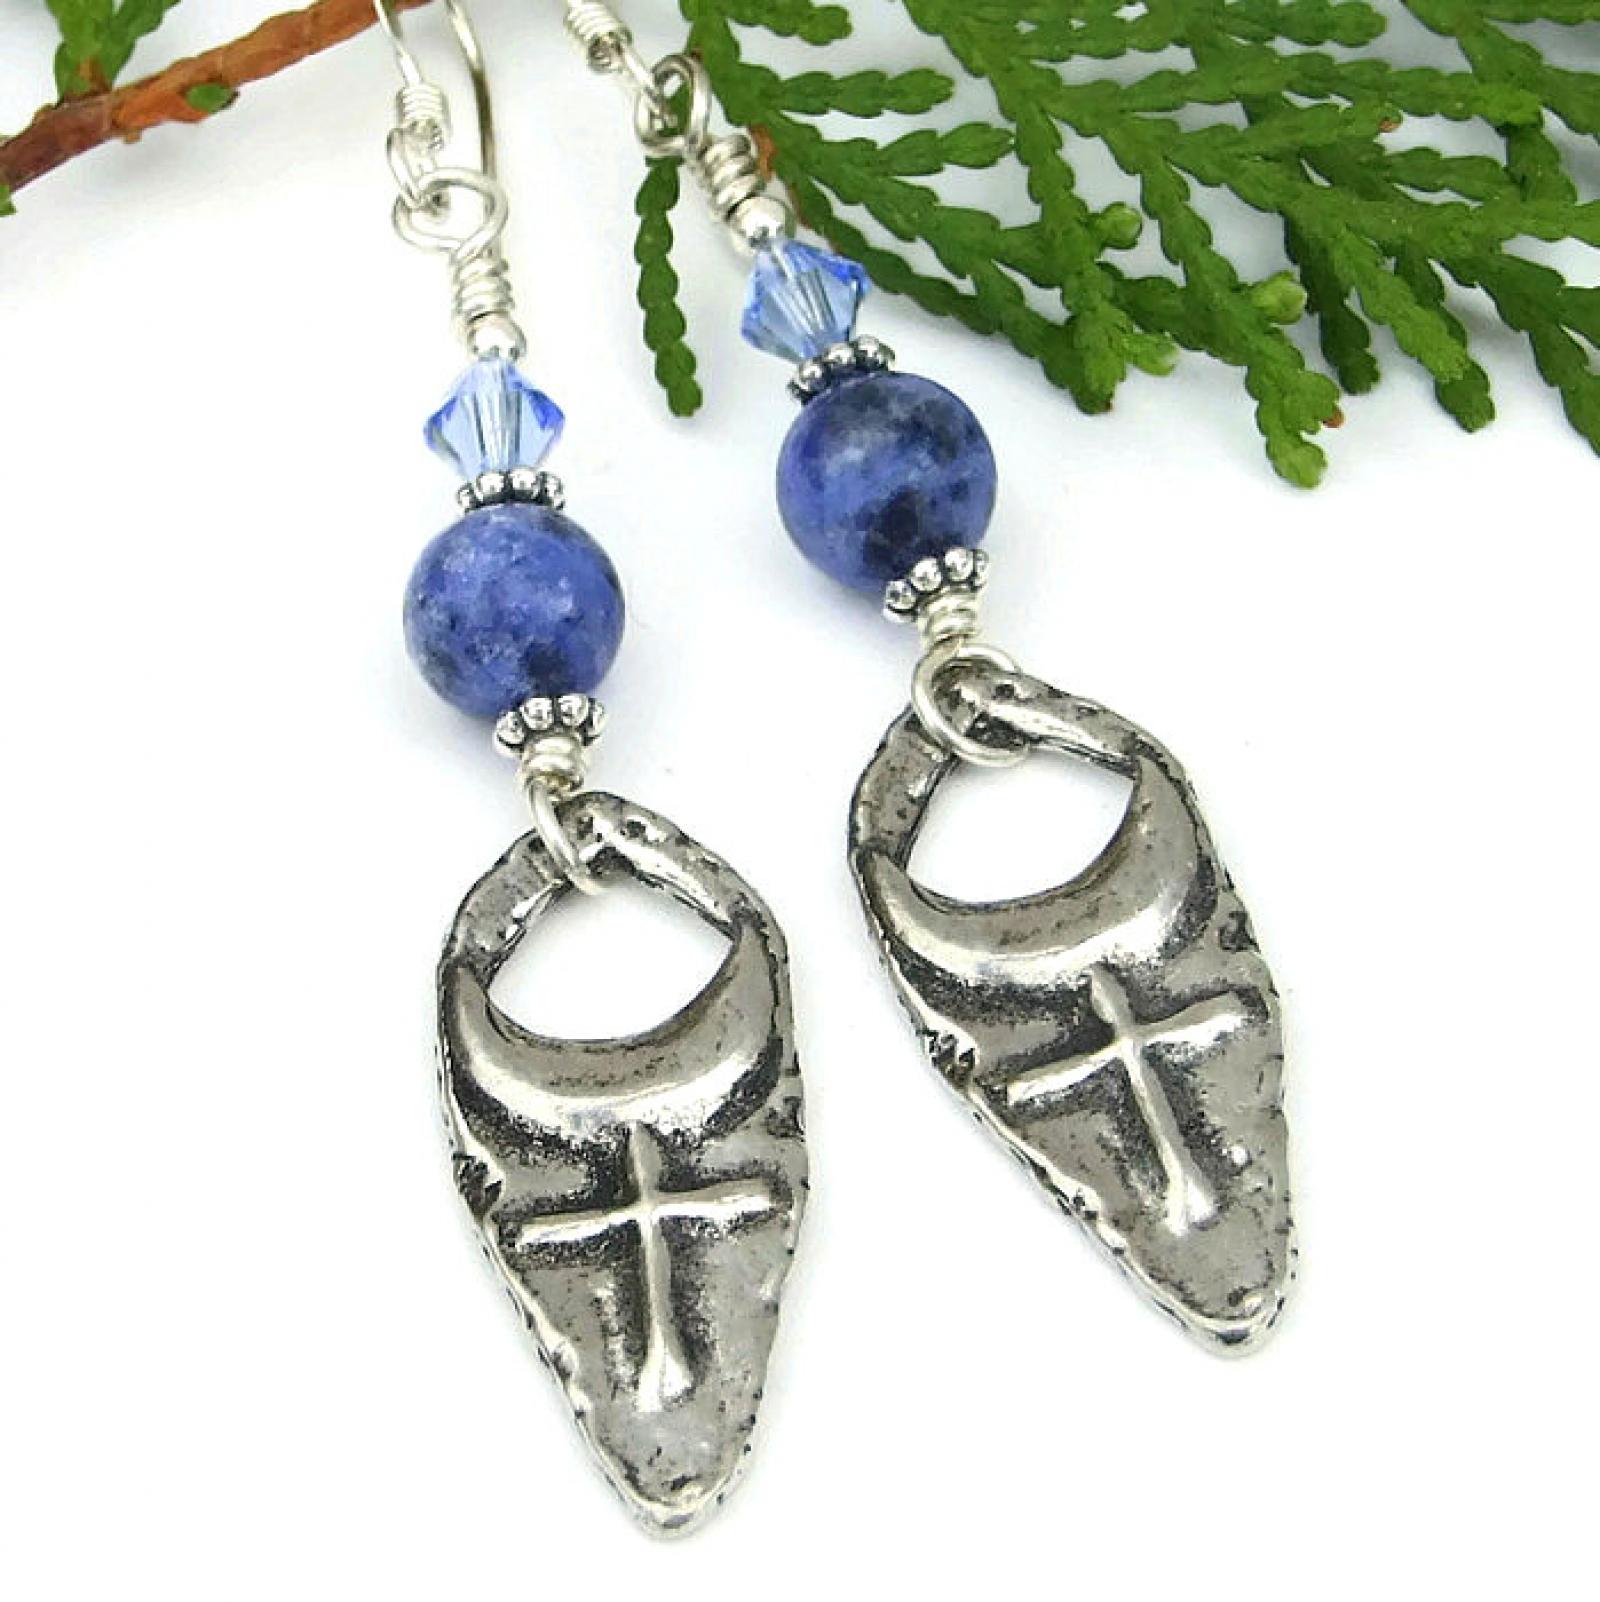 Cross and moon earrings sodalite swarovski mystical handmade mystical earrings for women gift idea aloadofball Choice Image